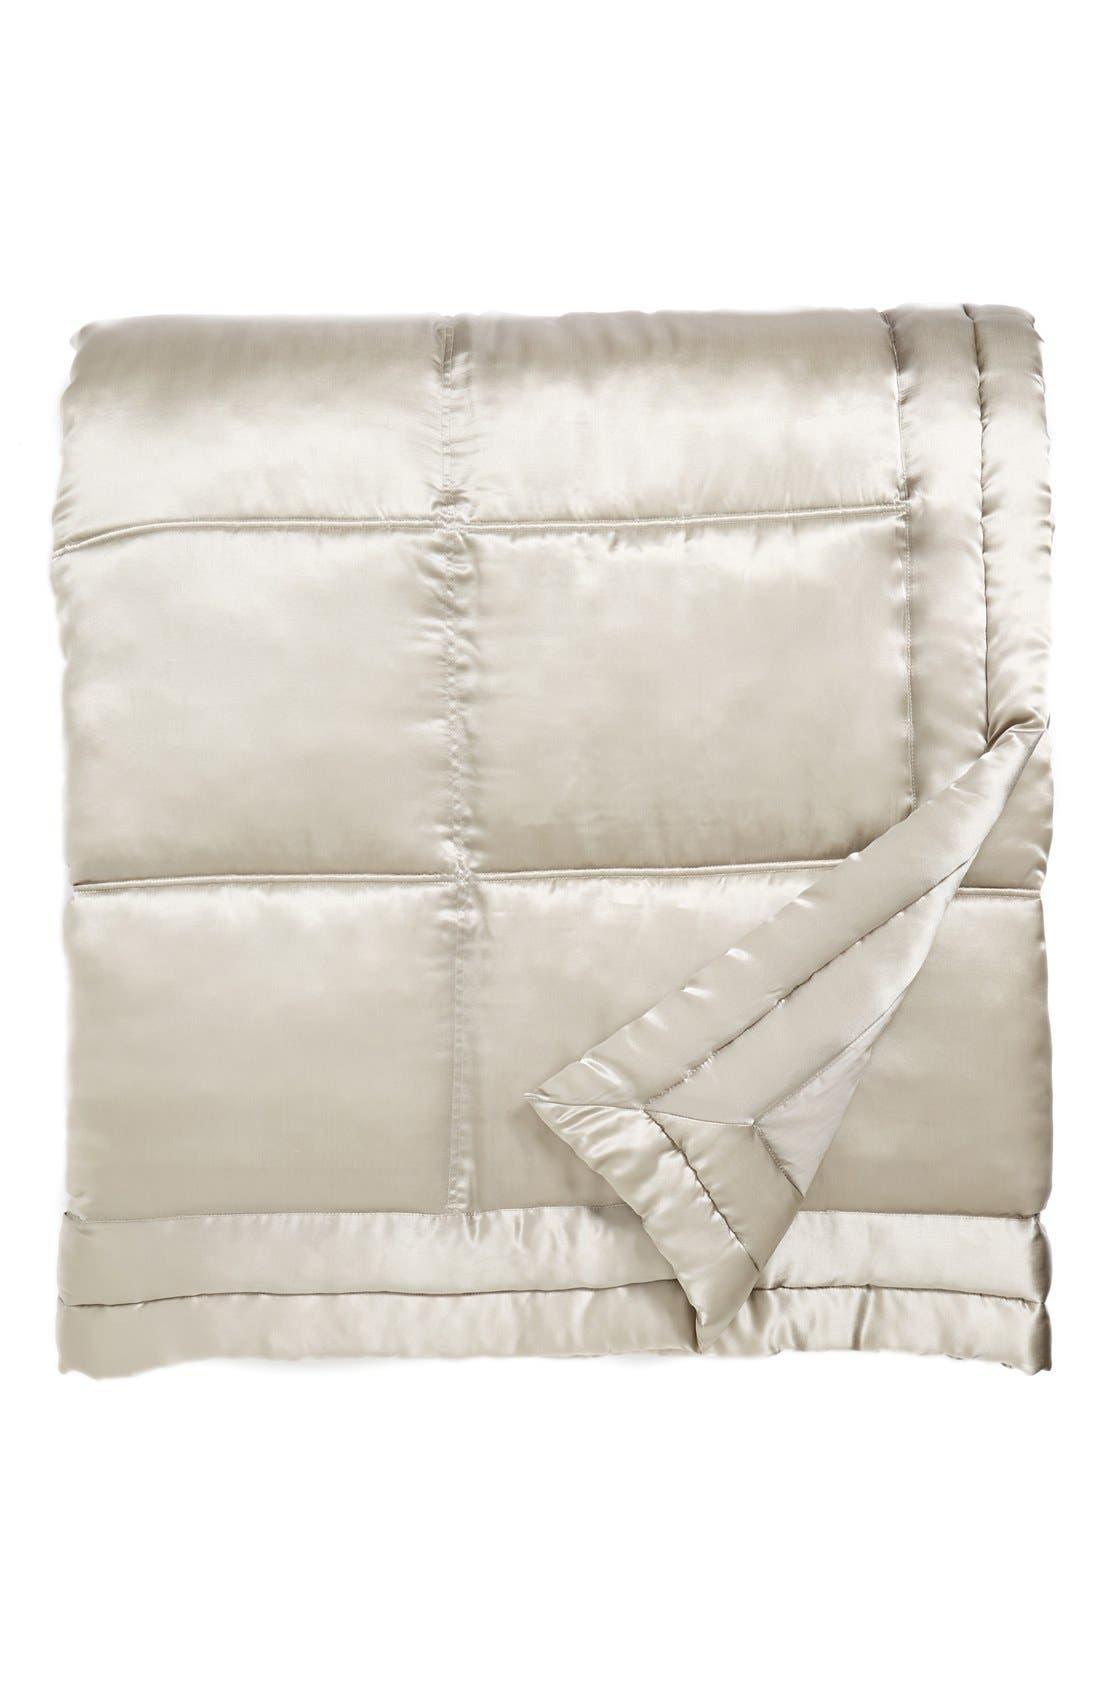 Donna Karan Collection 'Reflection' Silk Charmeuse Quilt